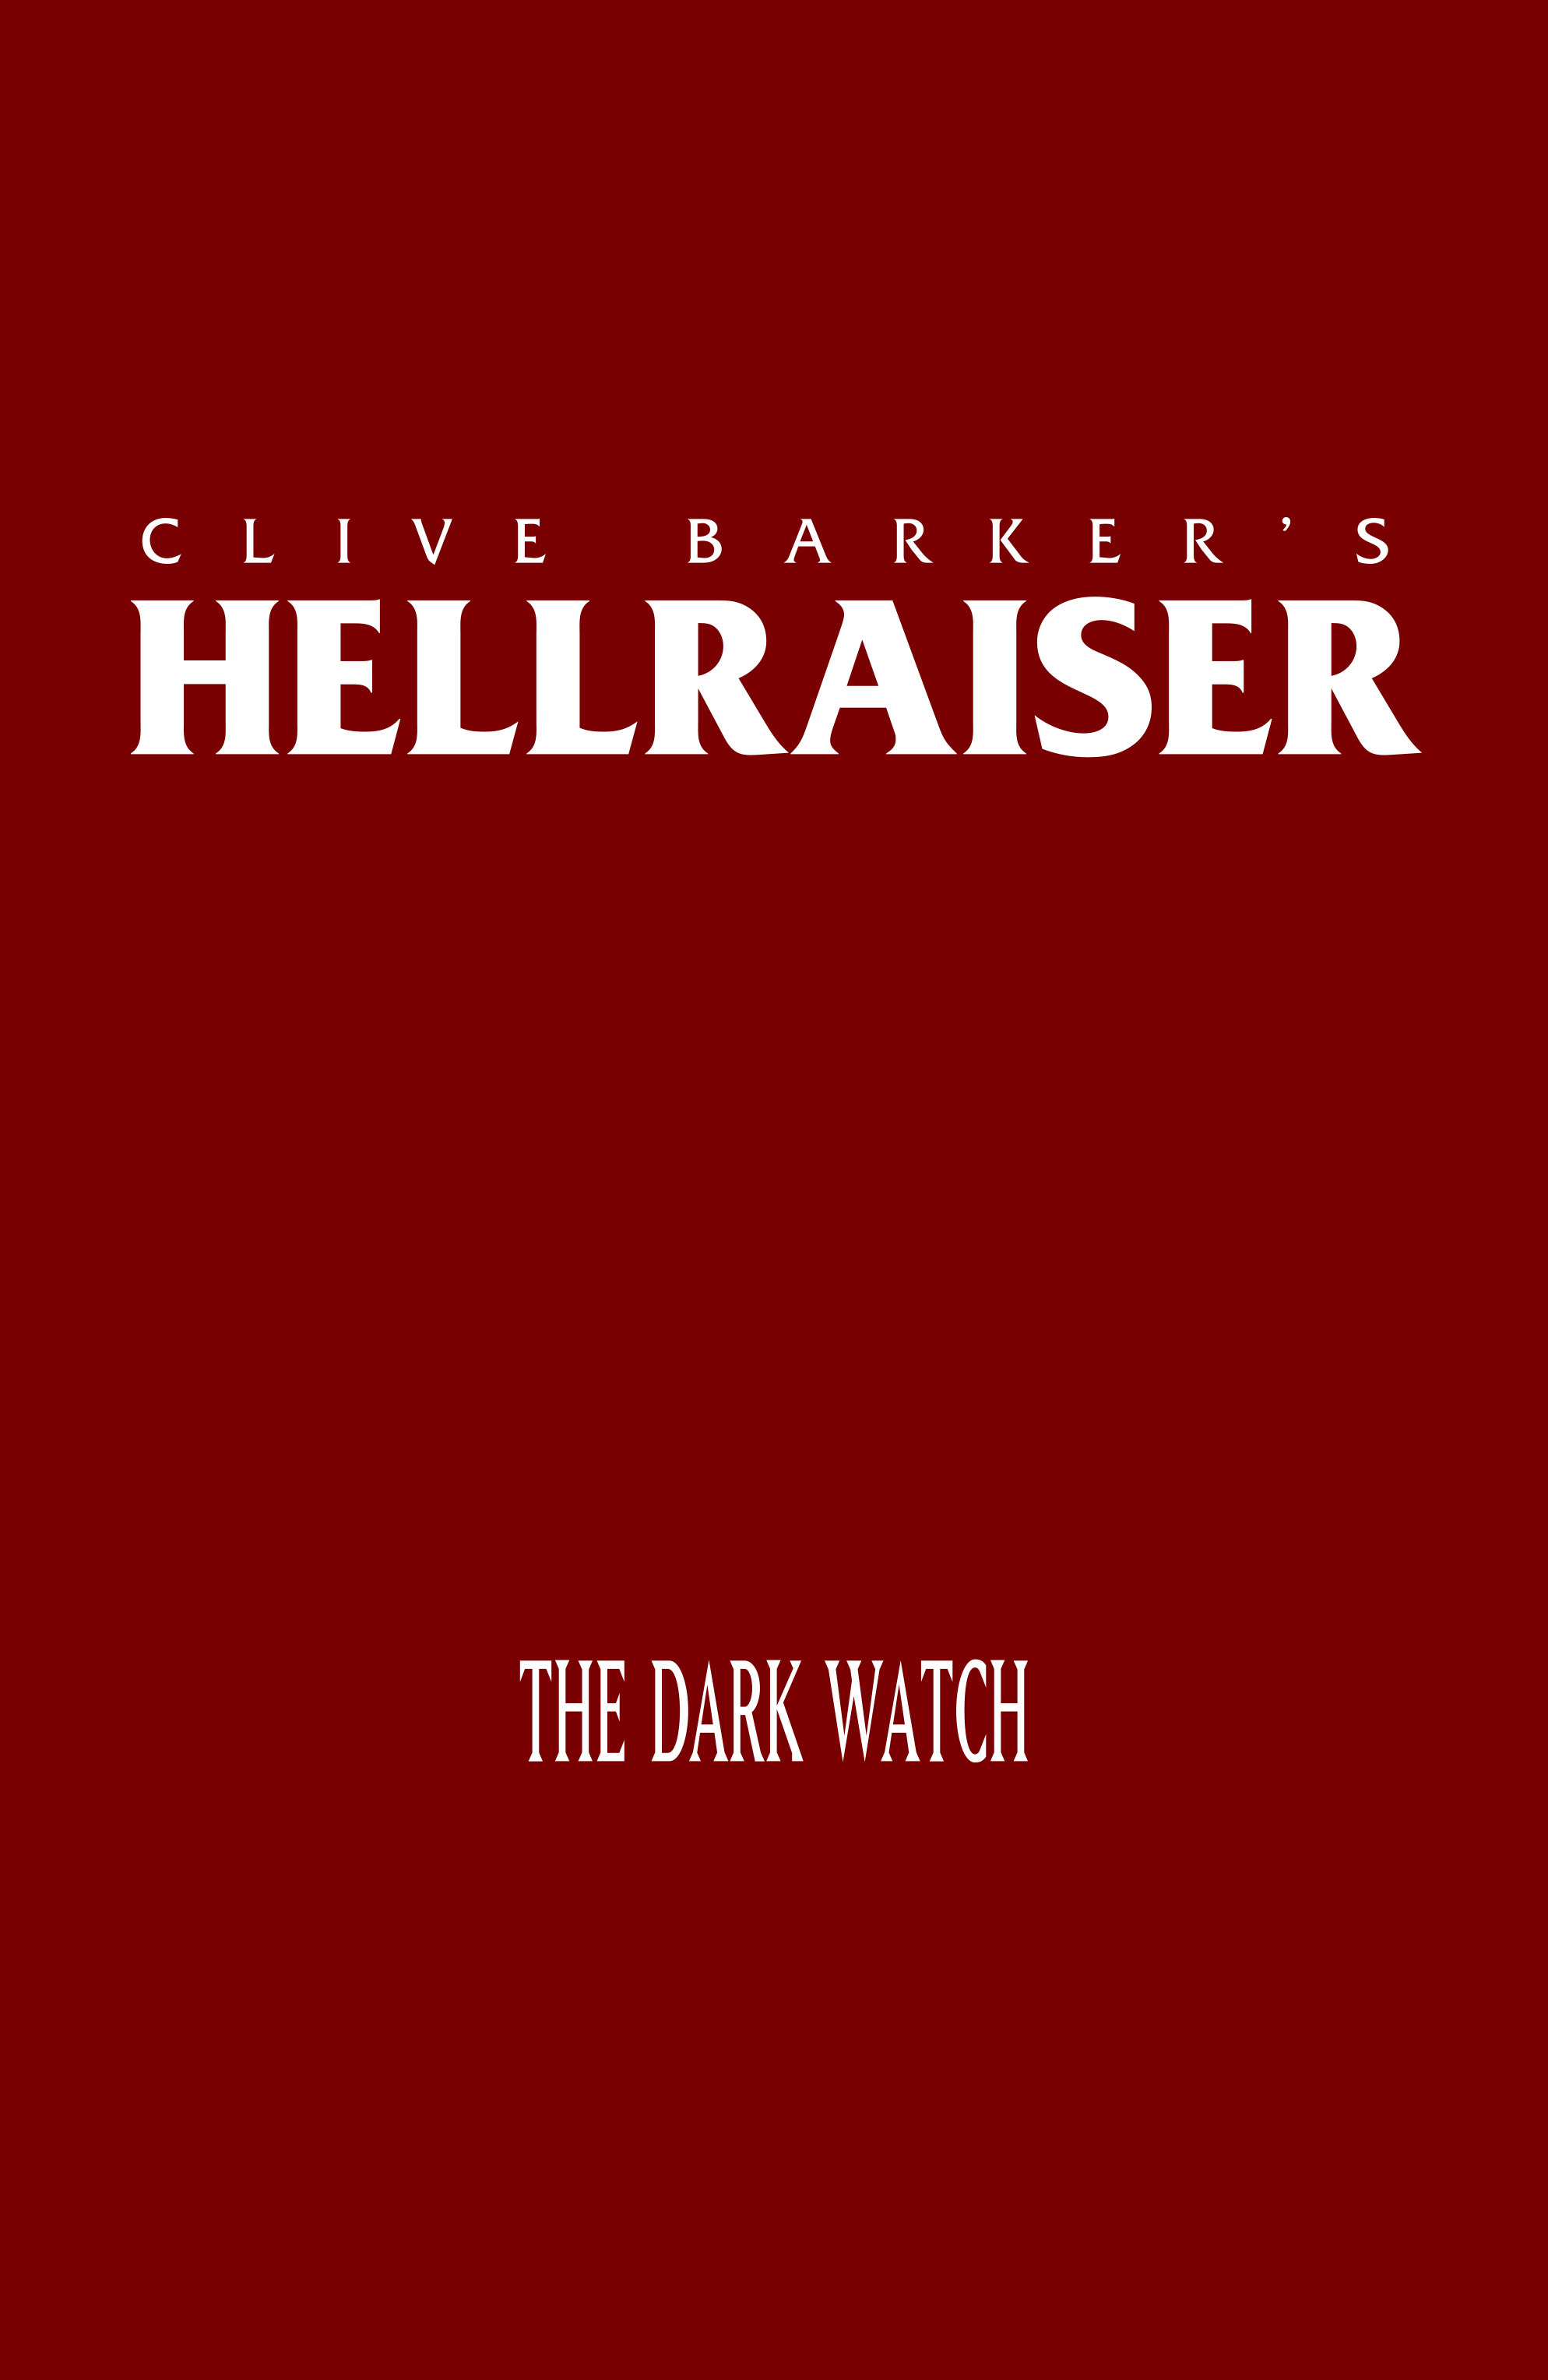 Read online Clive Barker's Hellraiser: The Dark Watch comic -  Issue # TPB 3 - 138